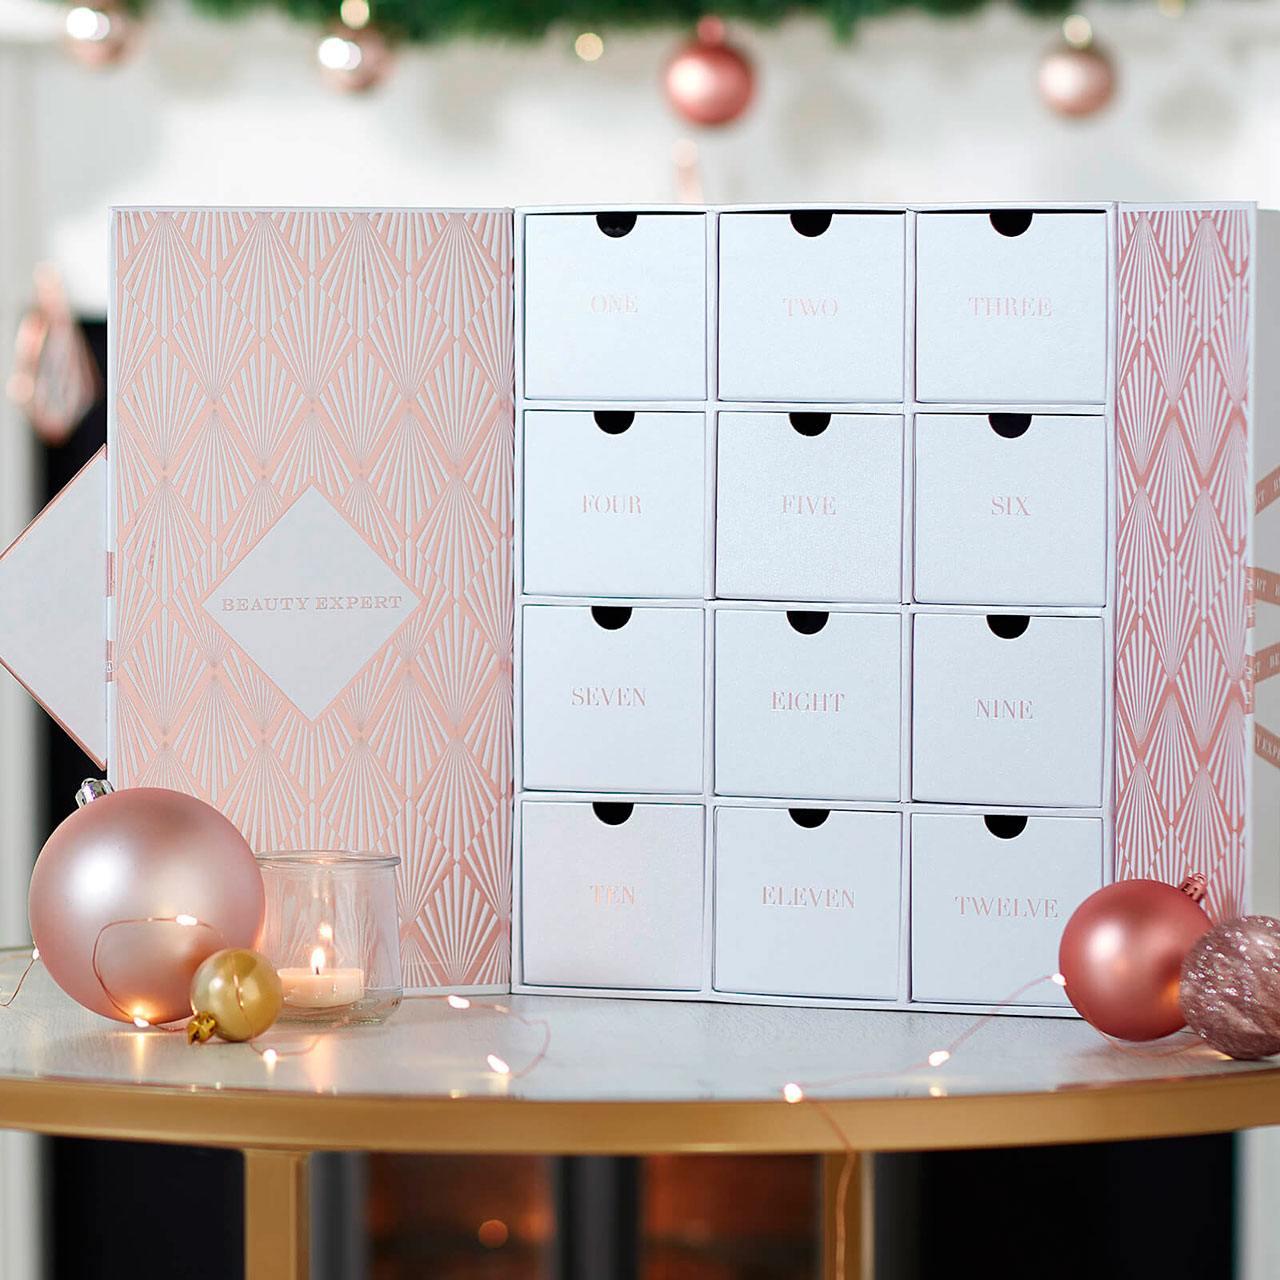 адвент-календарь Beauty Expert 12 Day of Christmas 2020